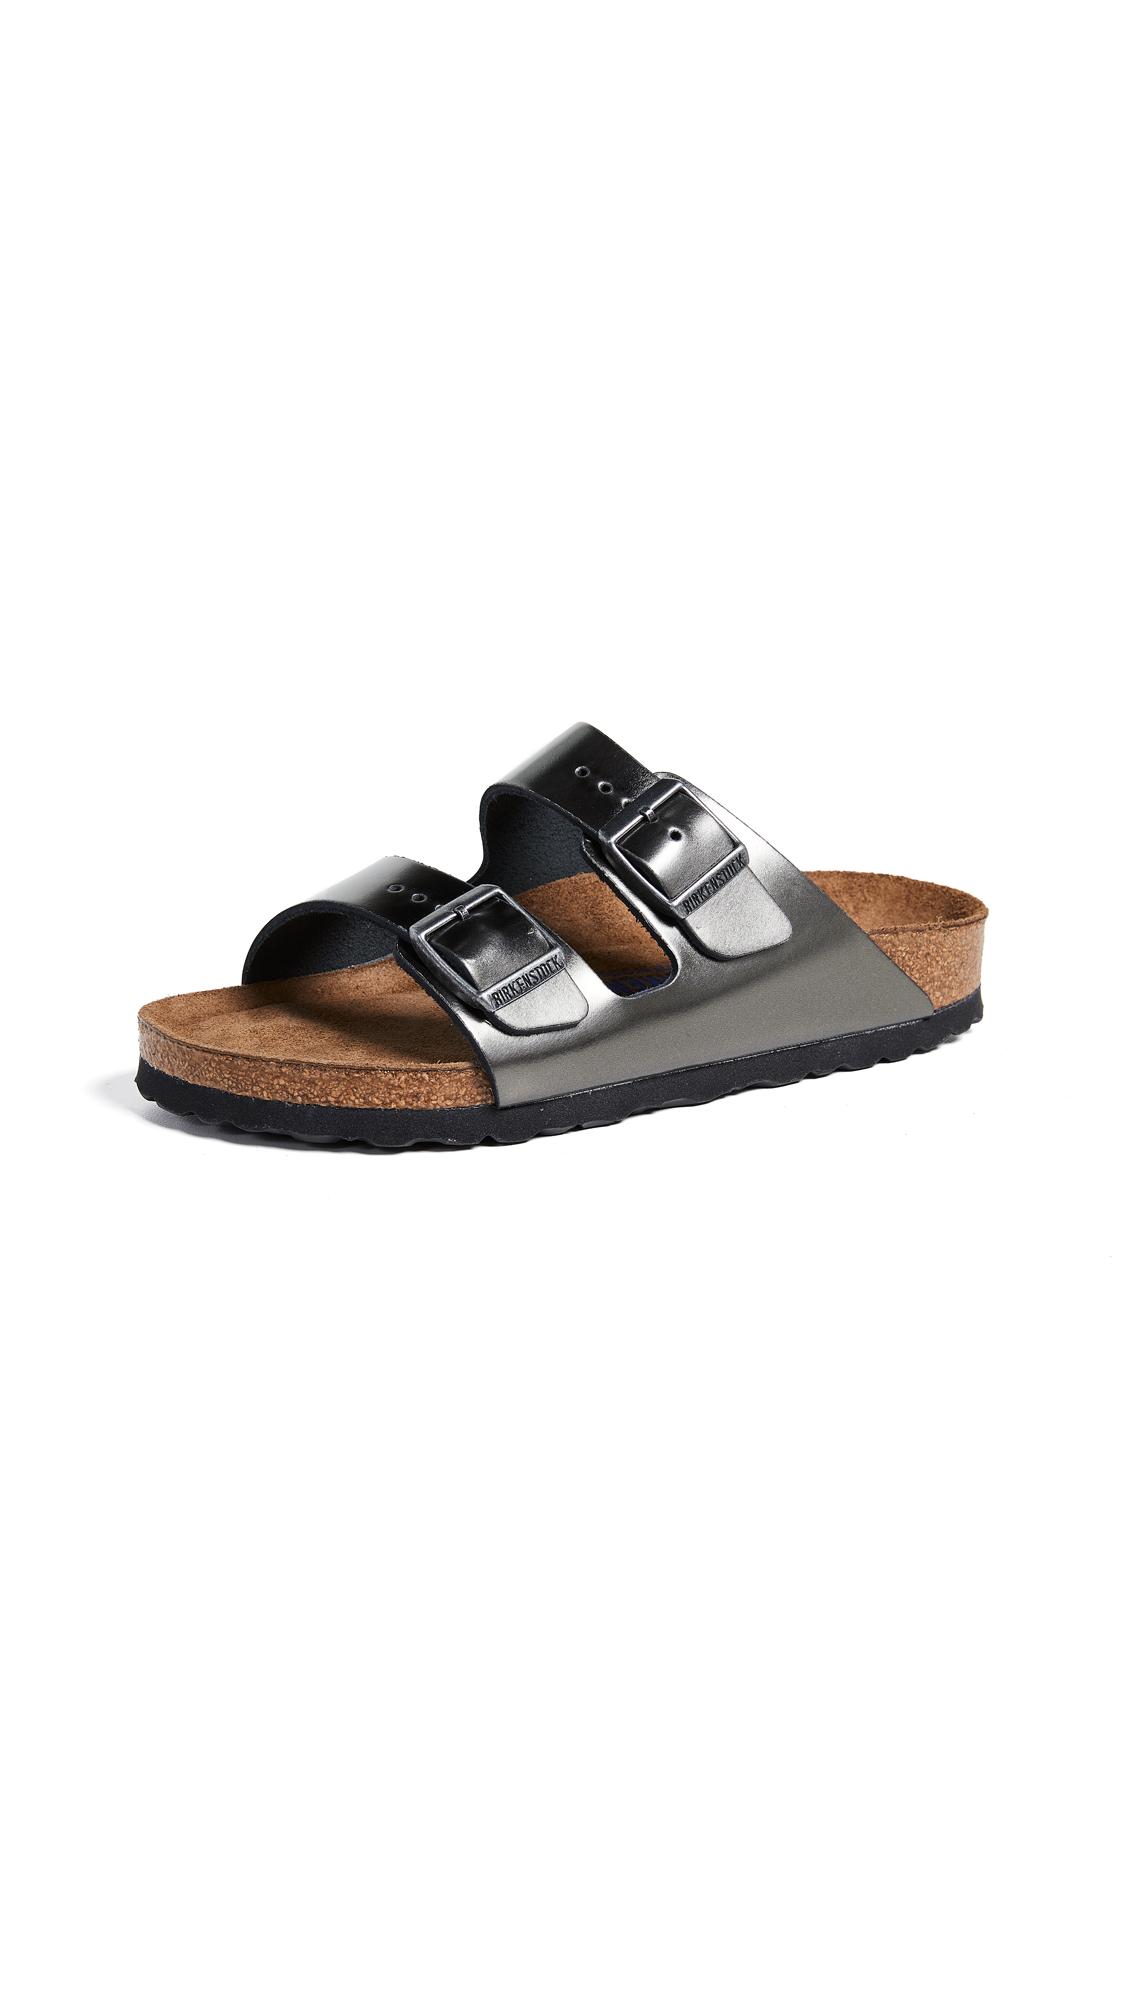 Birkenstock Arizona SFB Sandals - Metallic Anthracite